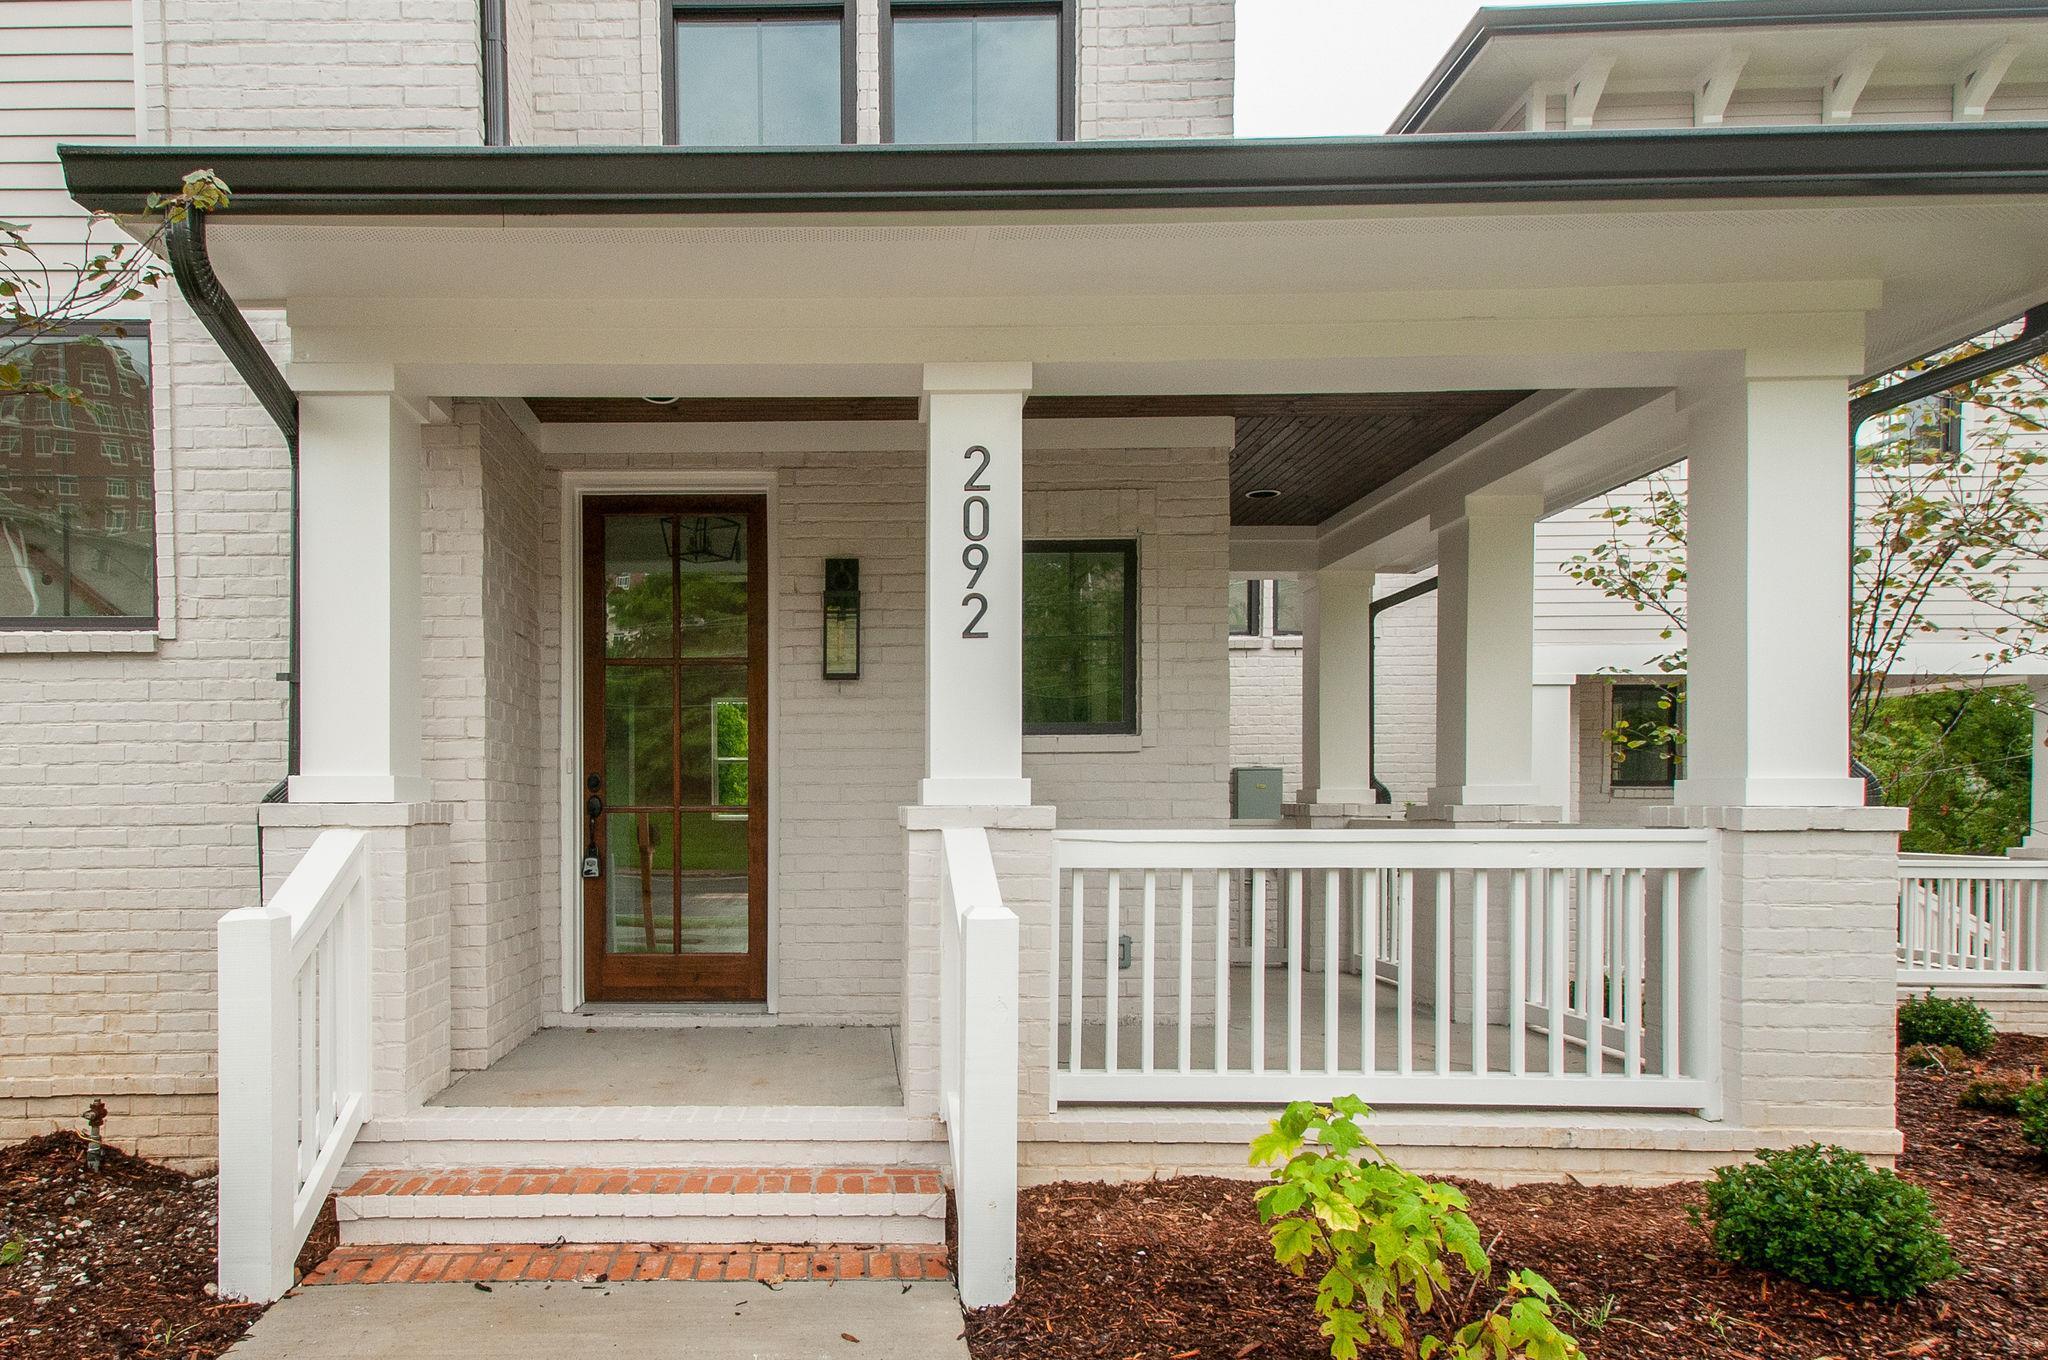 2092 12Th Ave S, Nashville, TN 37204 - Nashville, TN real estate listing